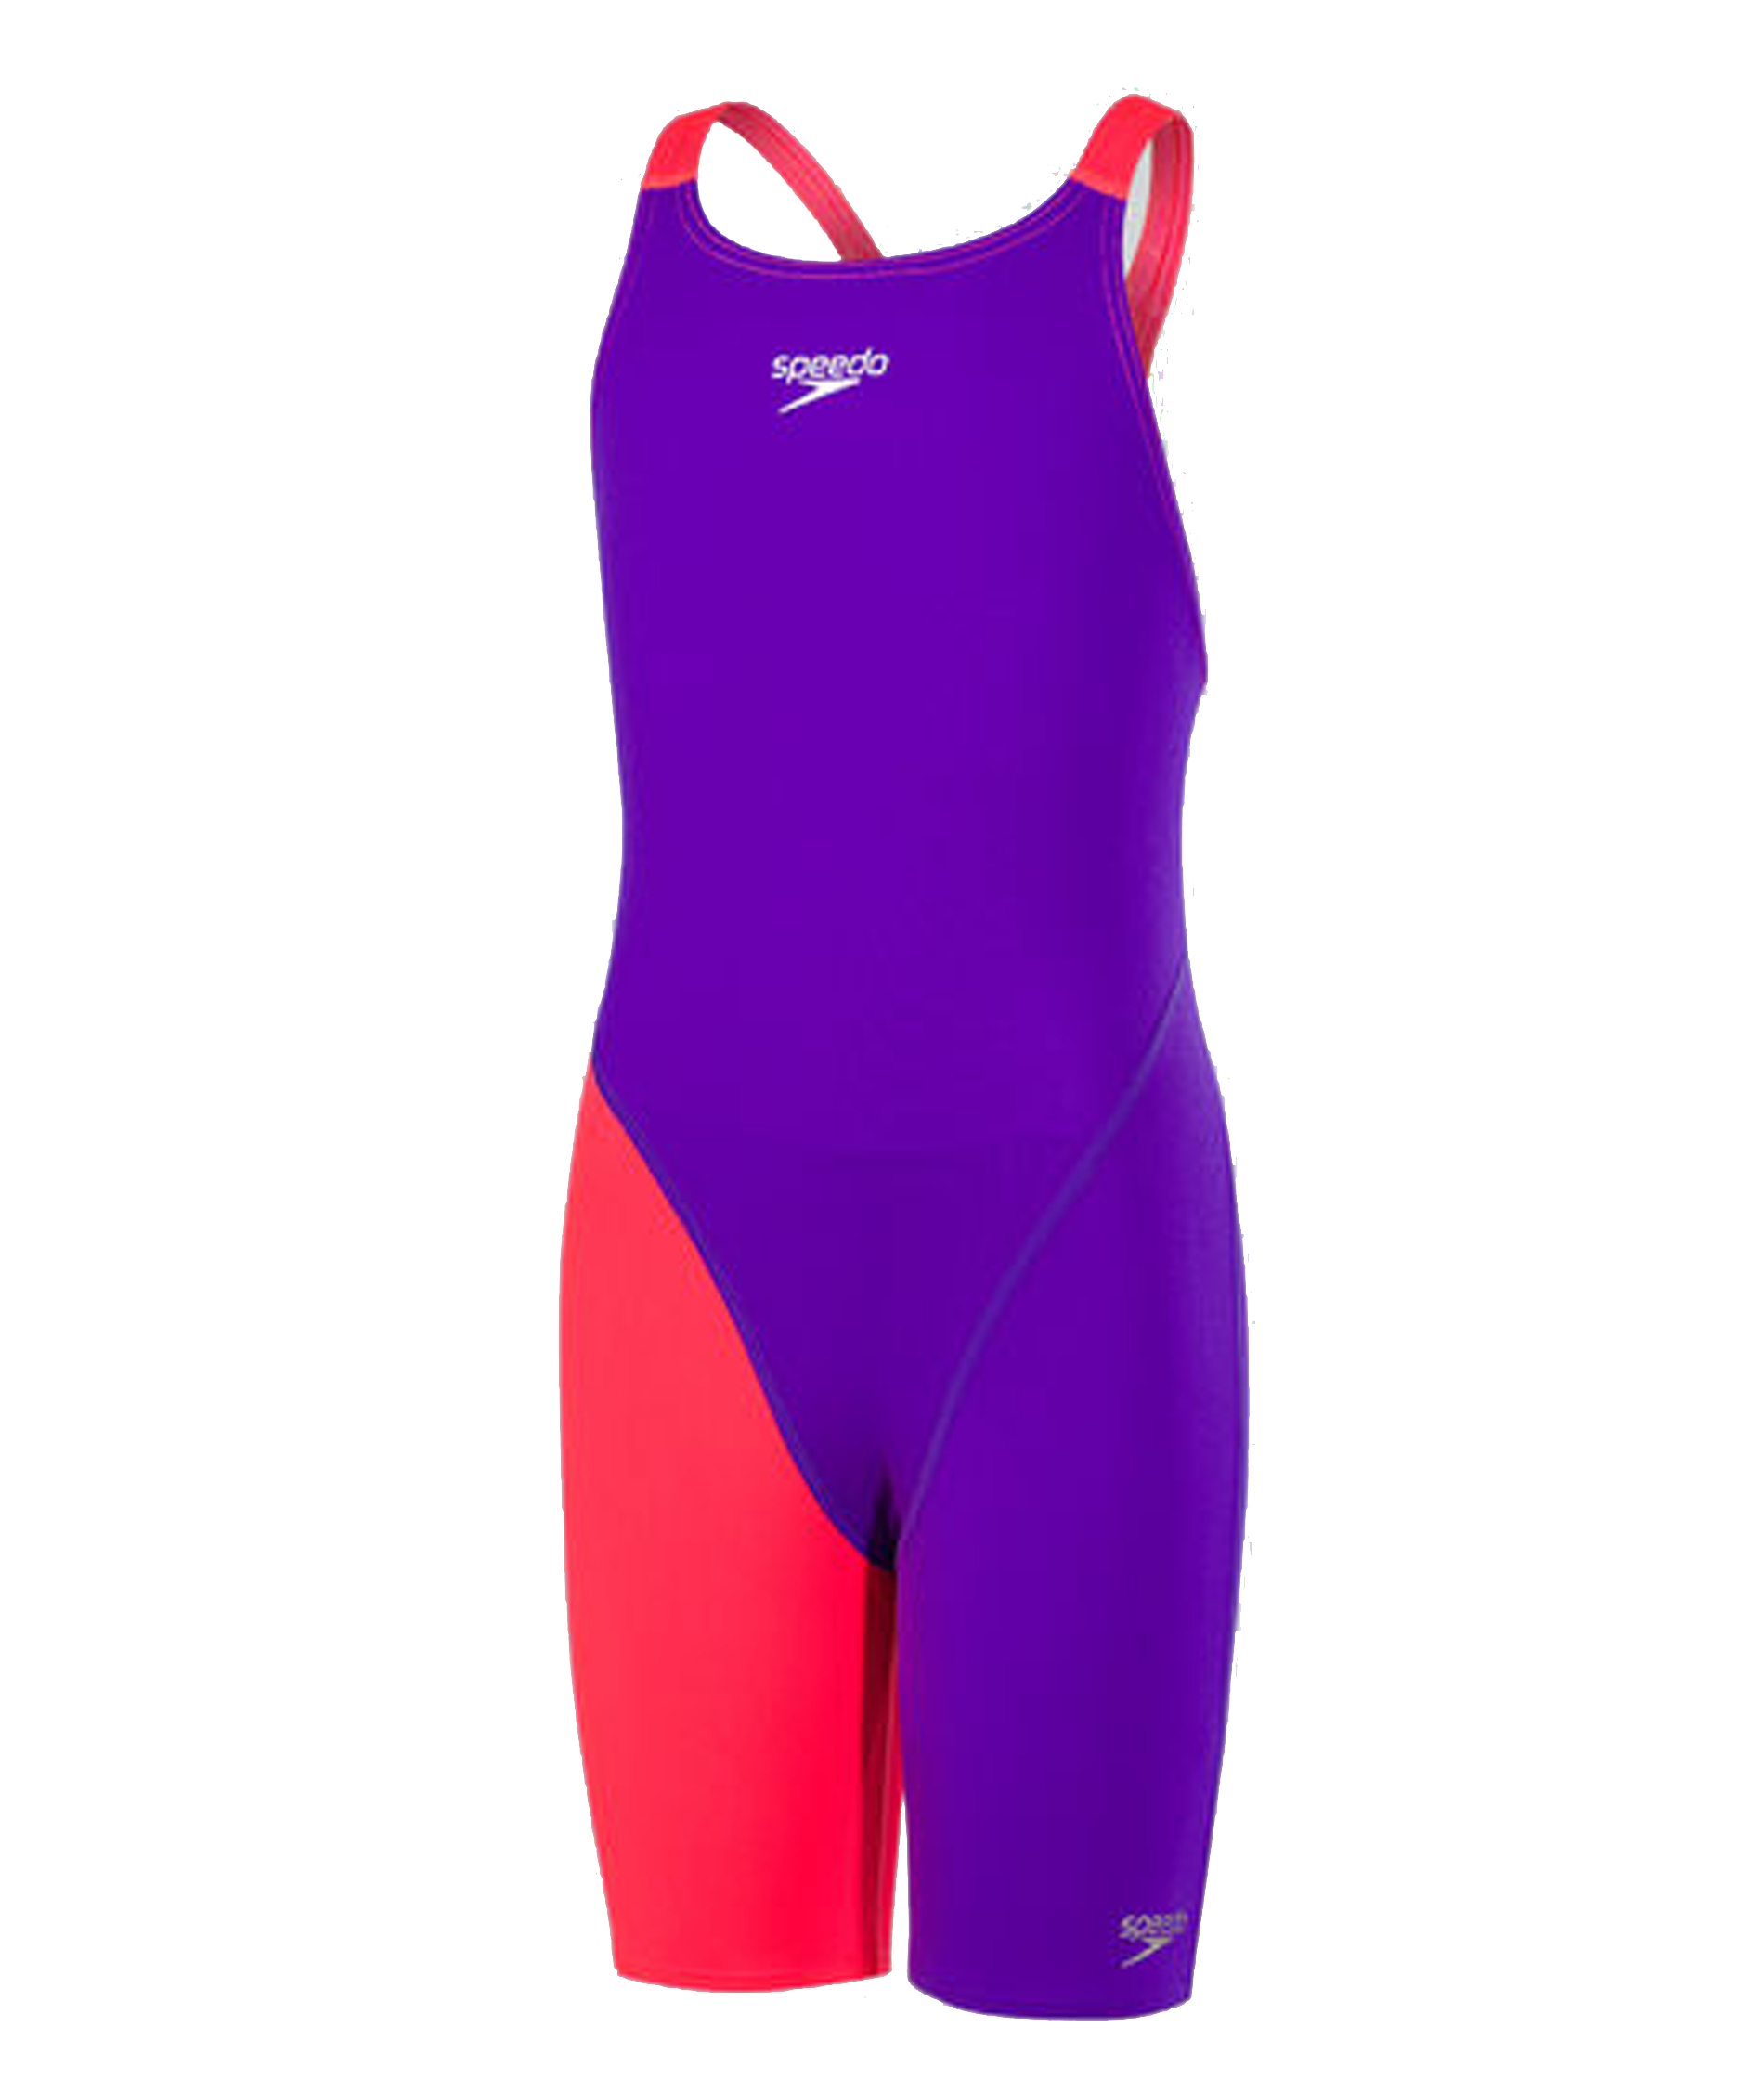 Speedo Junior Fastskin Endurance+ Openback Kneeskin - Purple/Red (24-30)